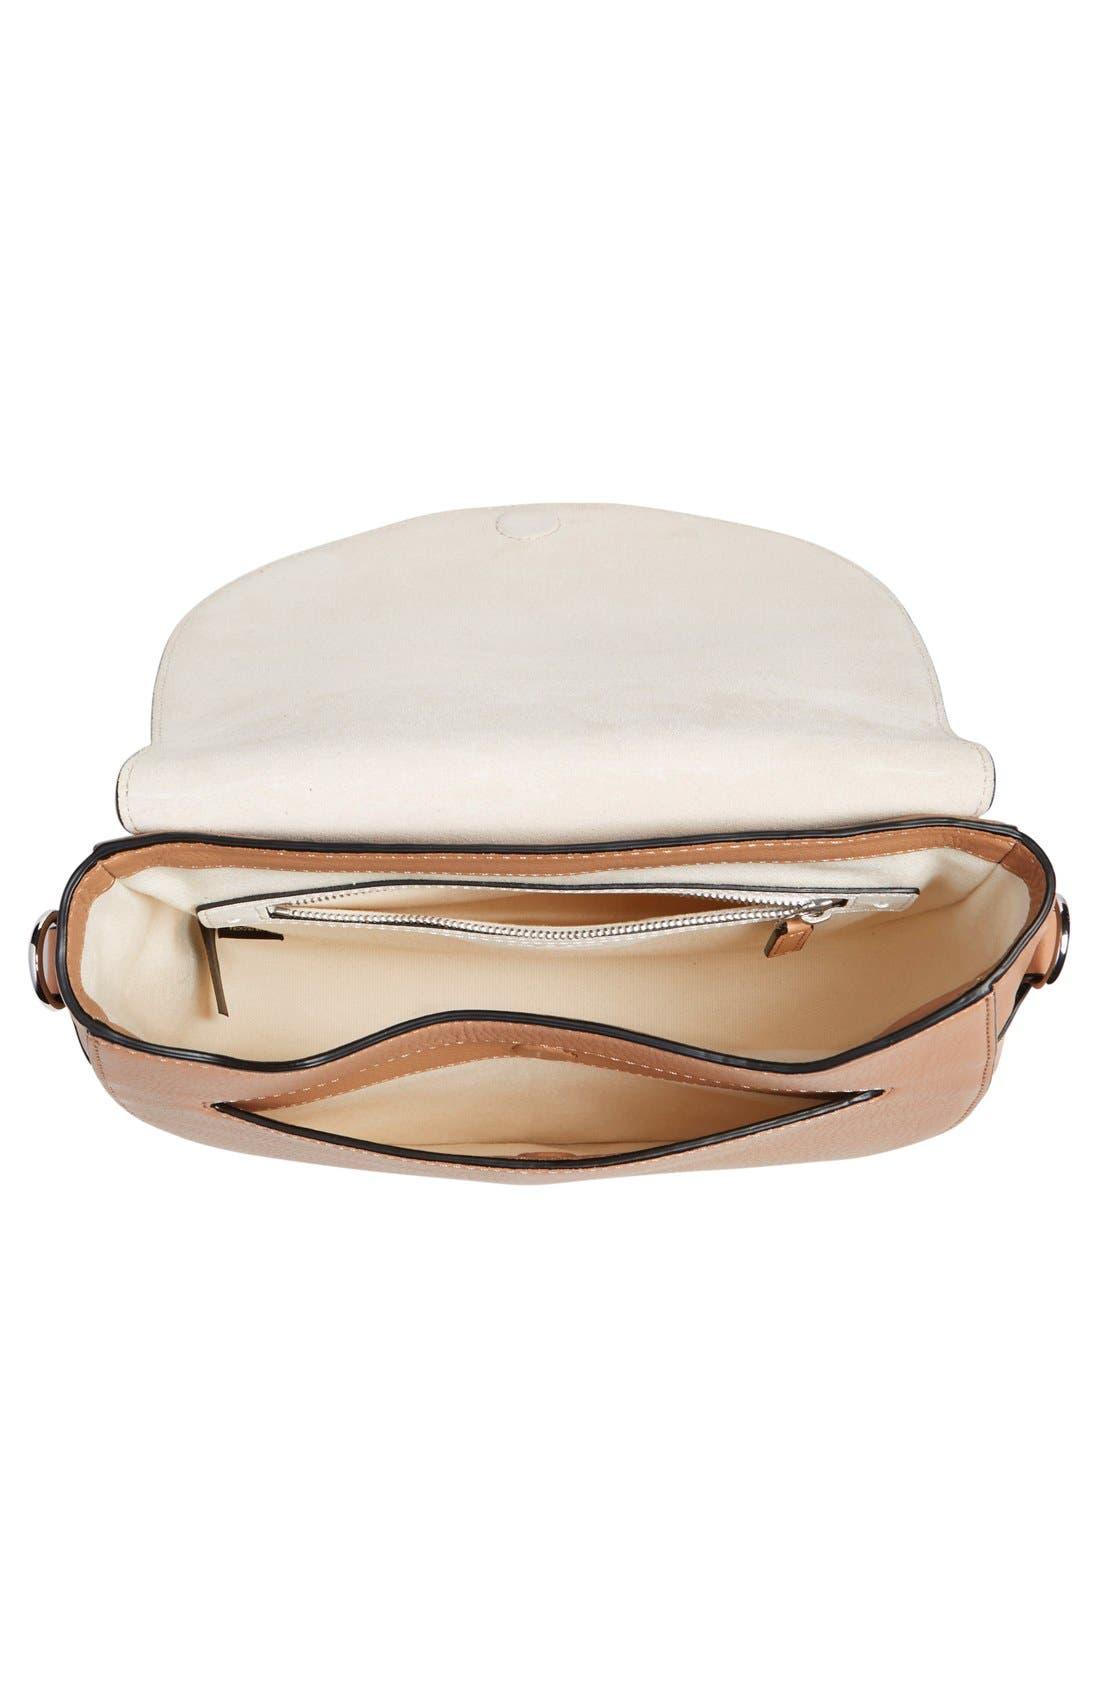 Alternate Image 3  - rag & bone 'Flight' Leather Crossbody Saddle Bag